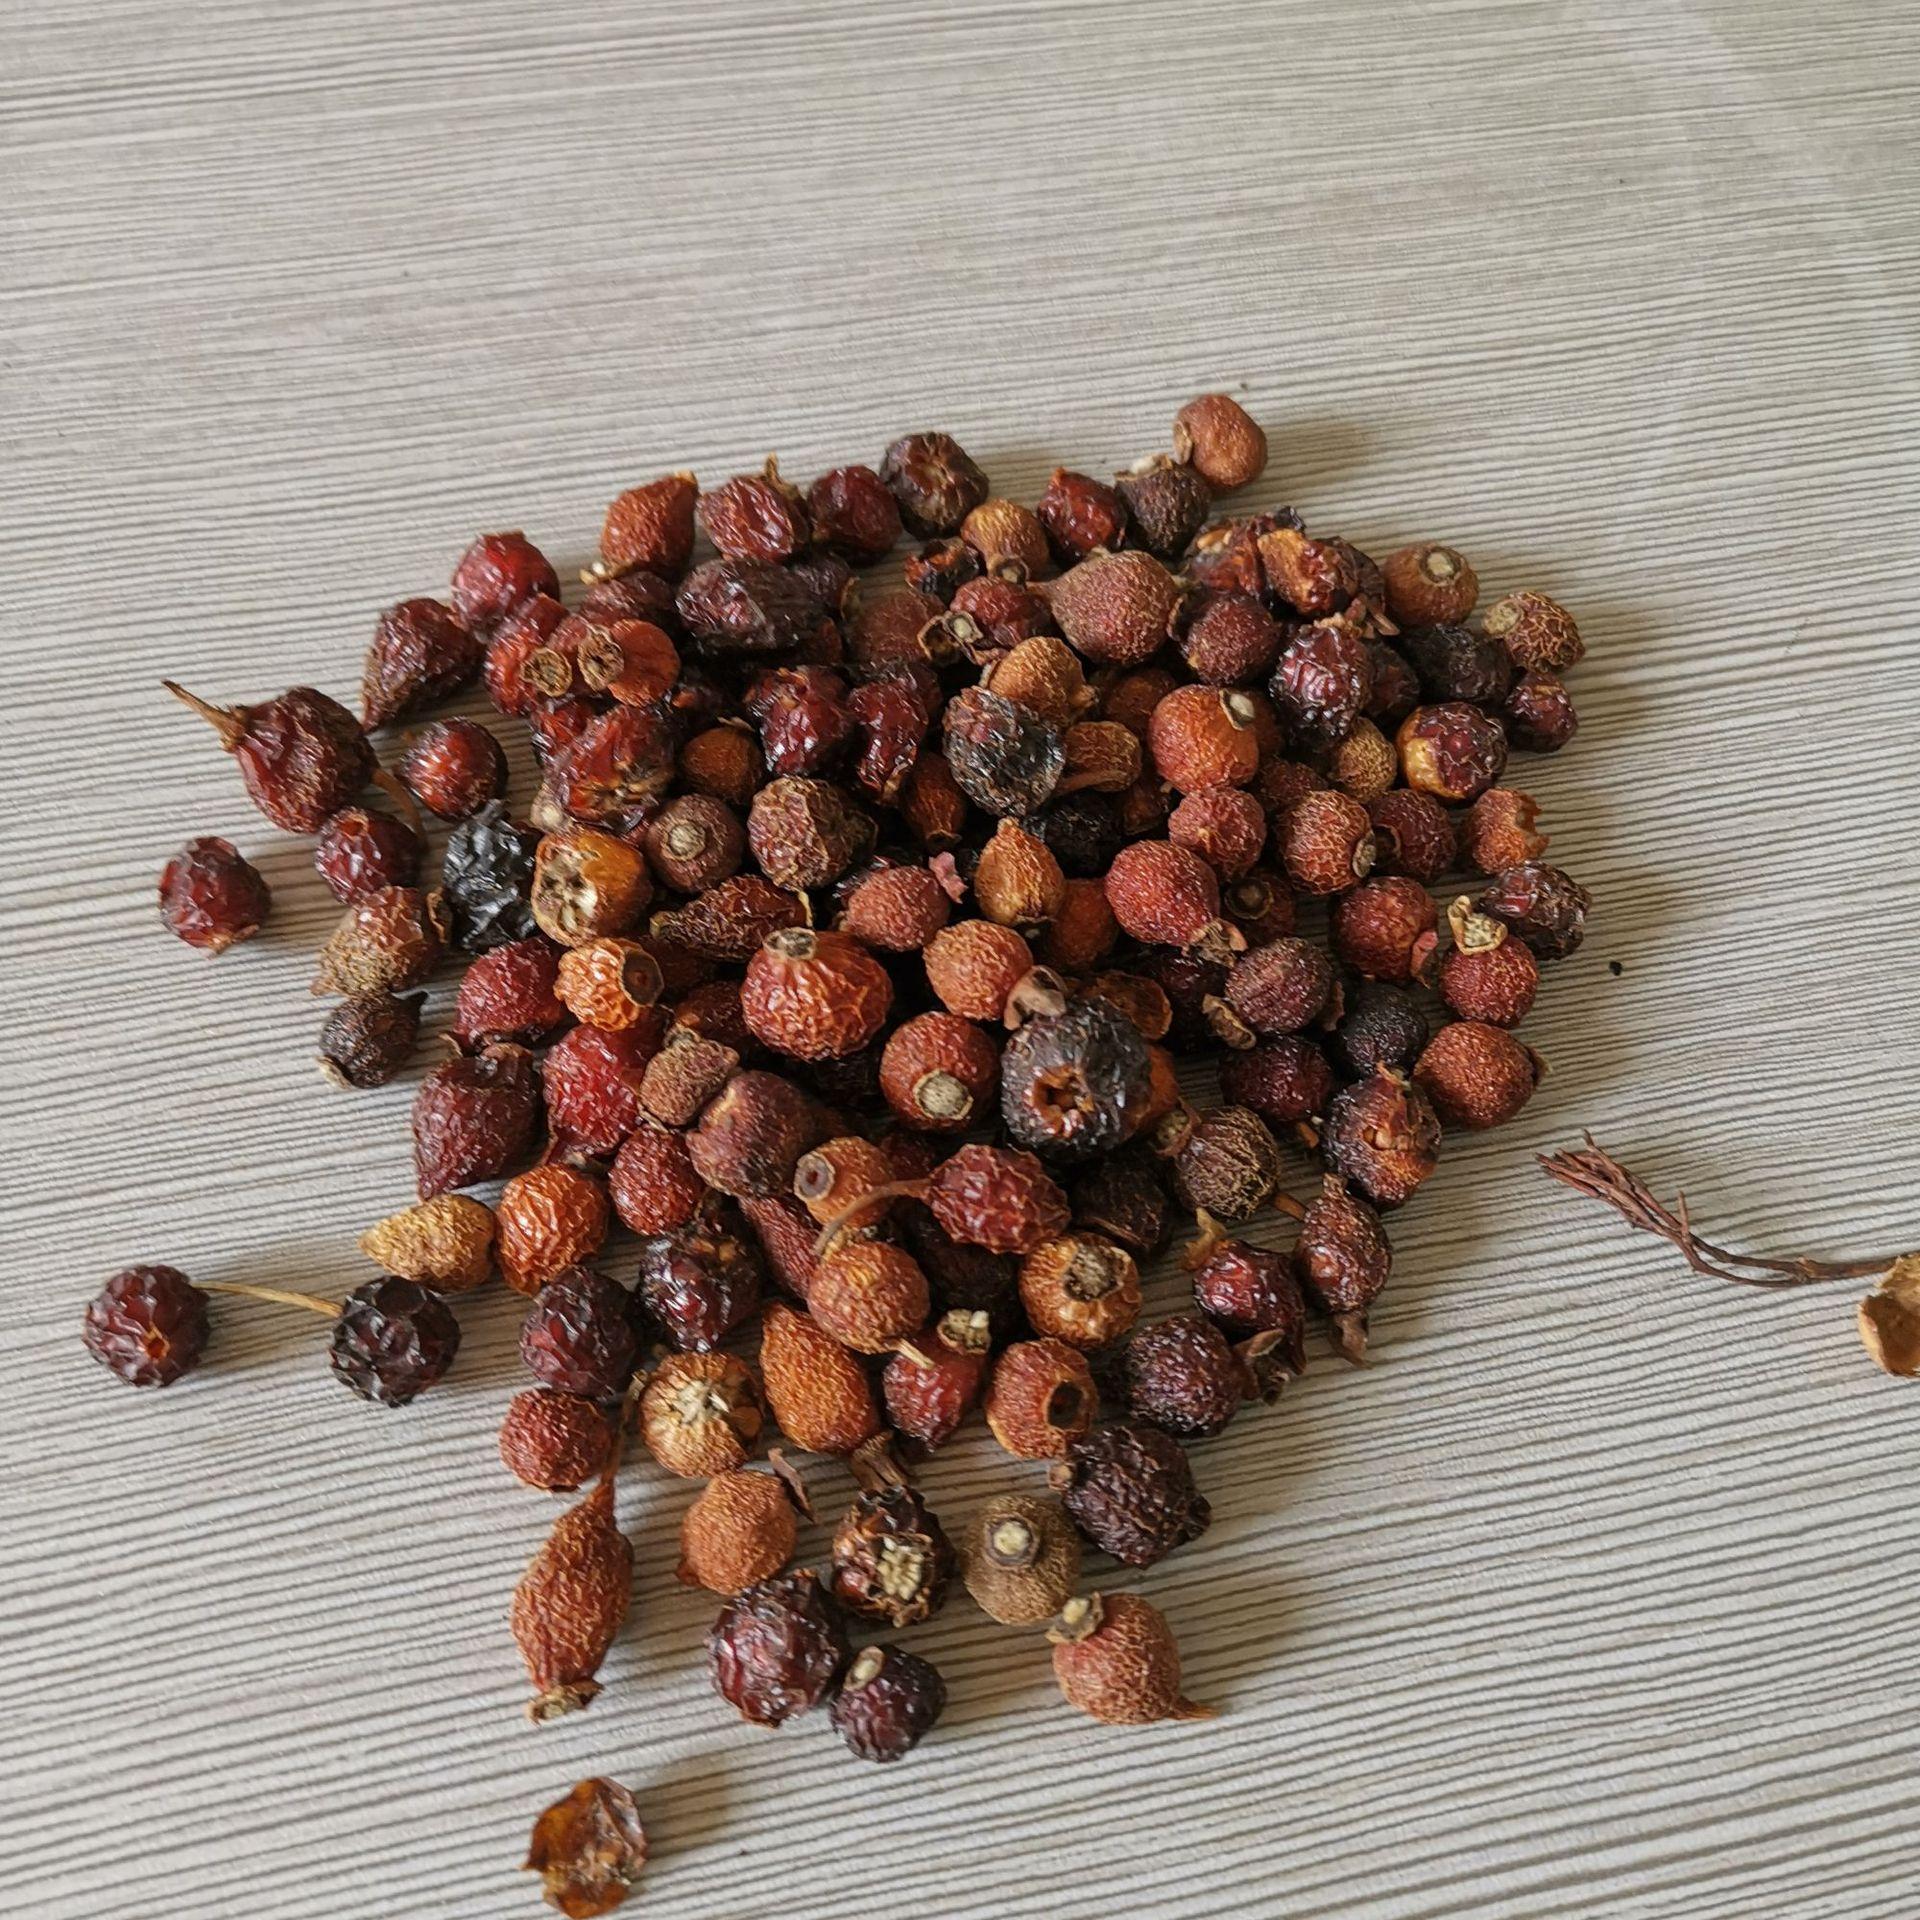 Wholesale Rosehip Fruit Rose Hip Dried Rosehip Tea High Quality Clean Rosehip Dried - 4uTea   4uTea.com